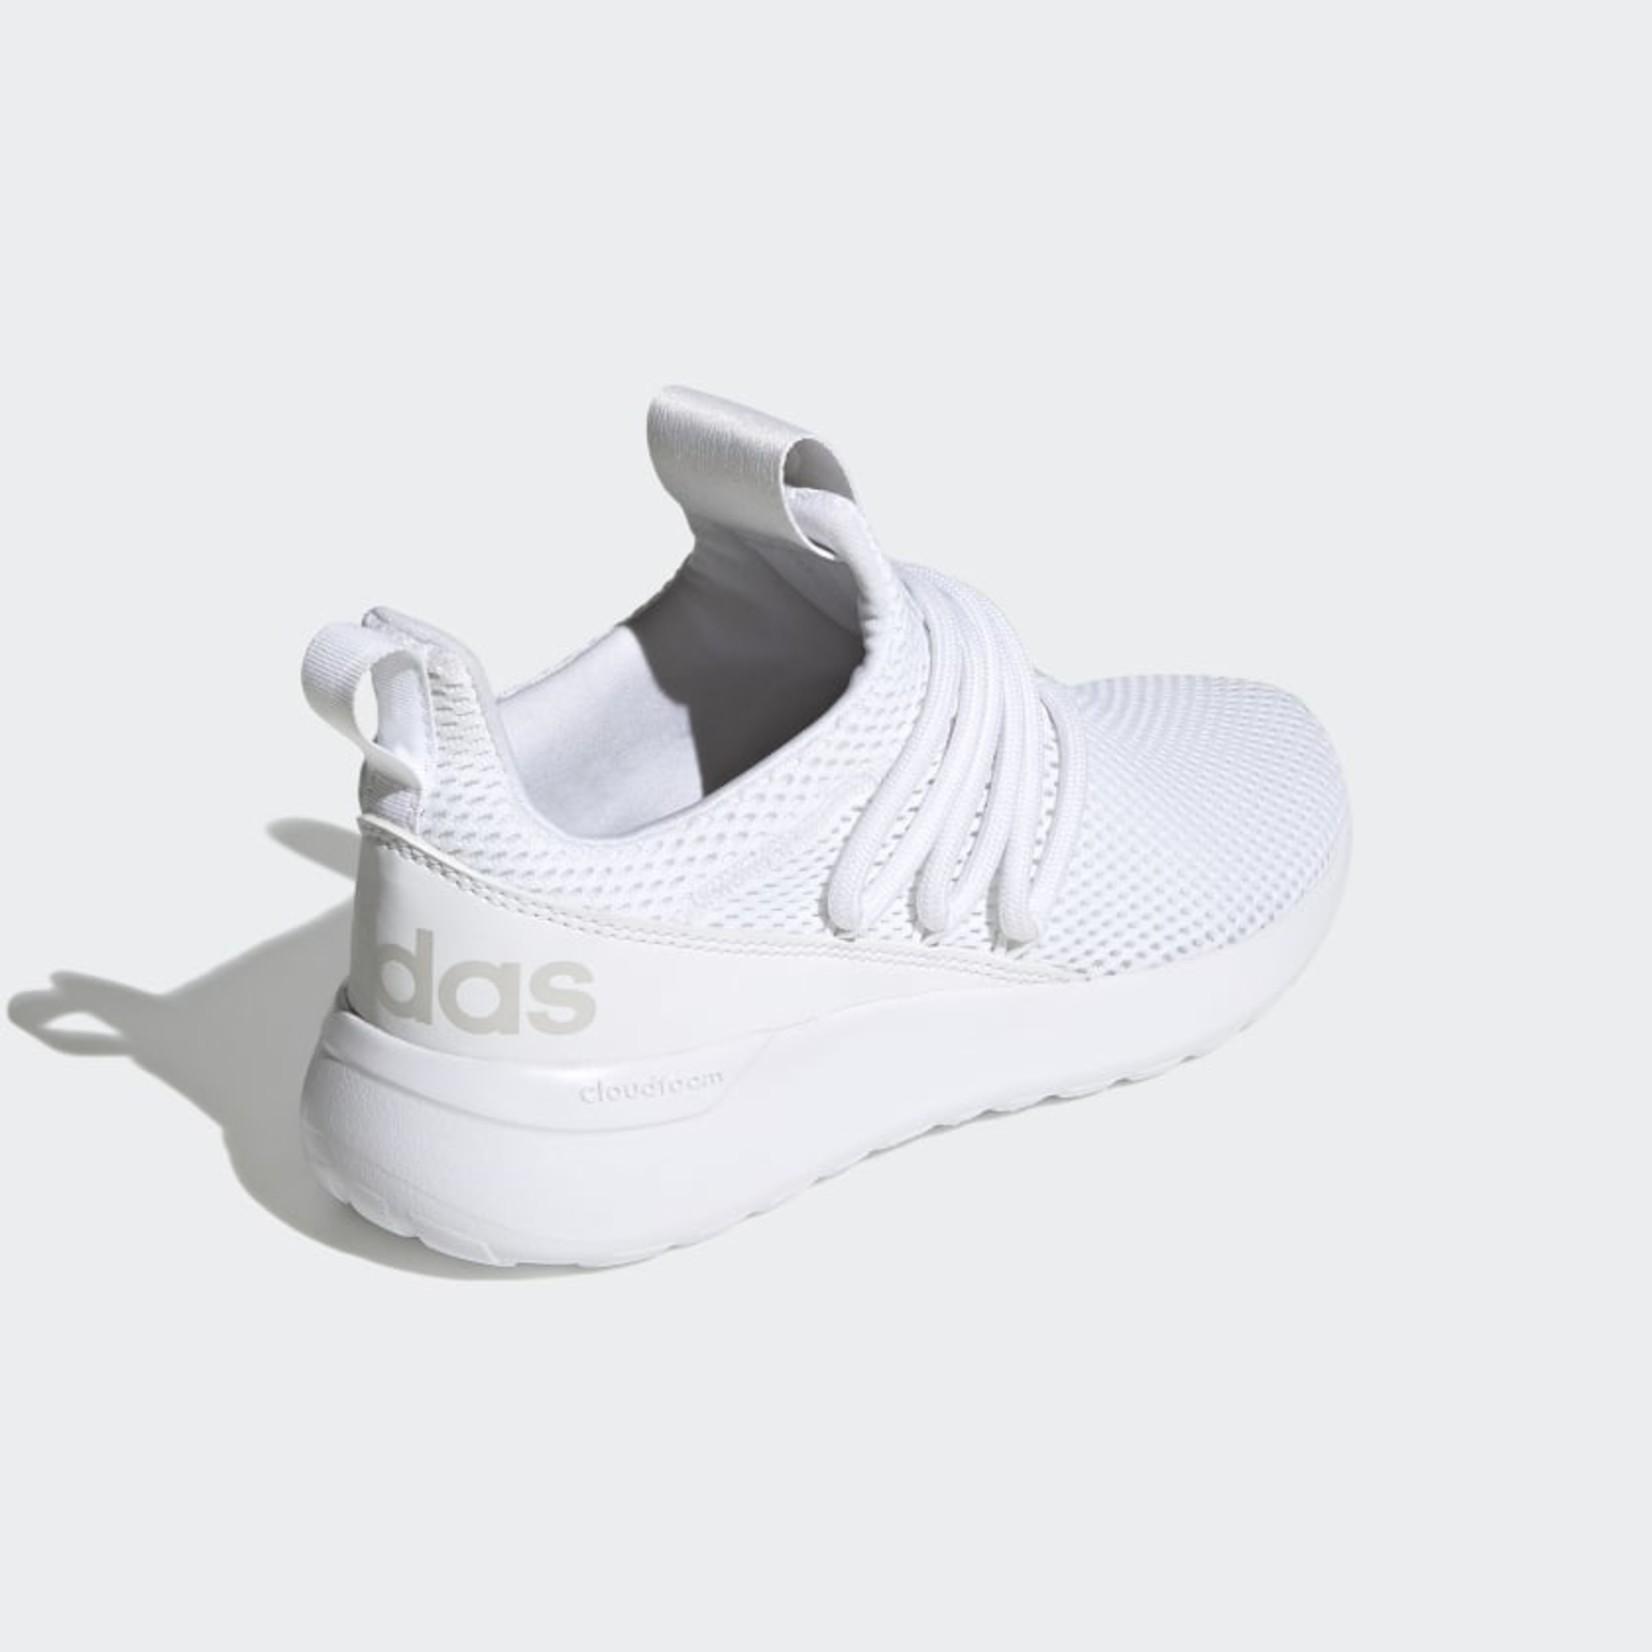 Adidas Adidas Kids Lite Racer Adapt 3.0